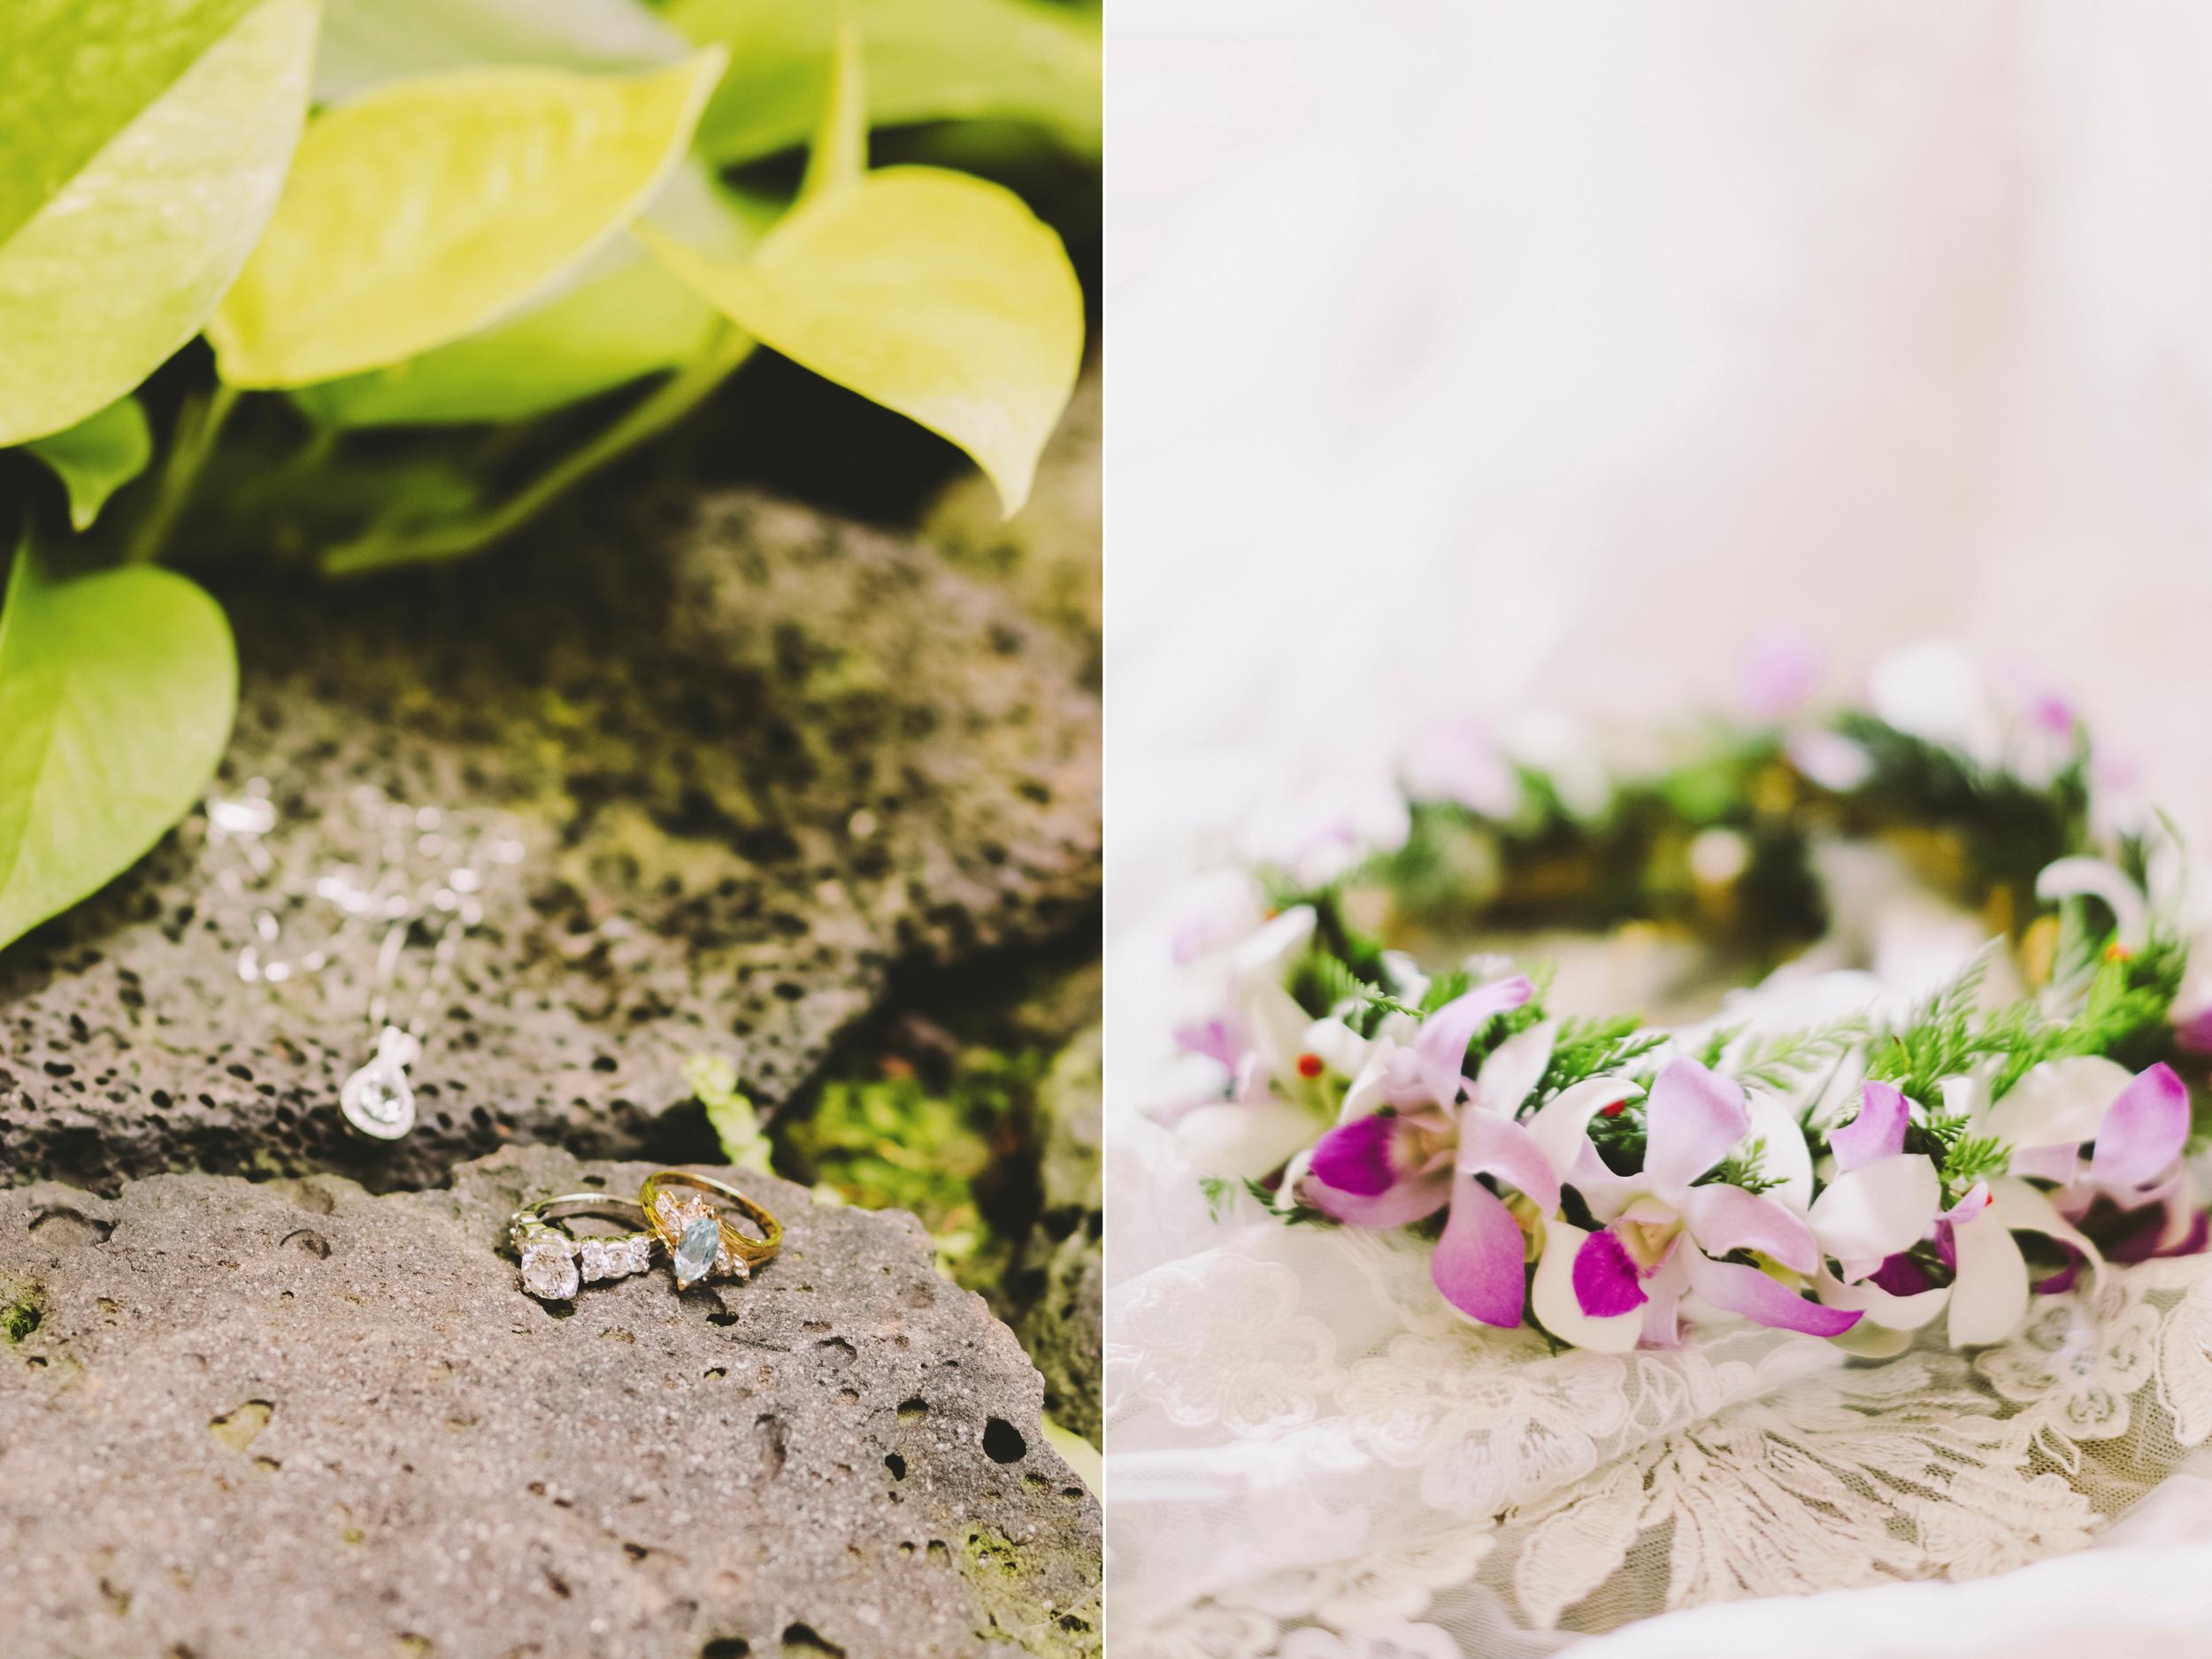 angie-diaz-photography-hawaii-wedding-photographer-kelli-jay-8.jpg